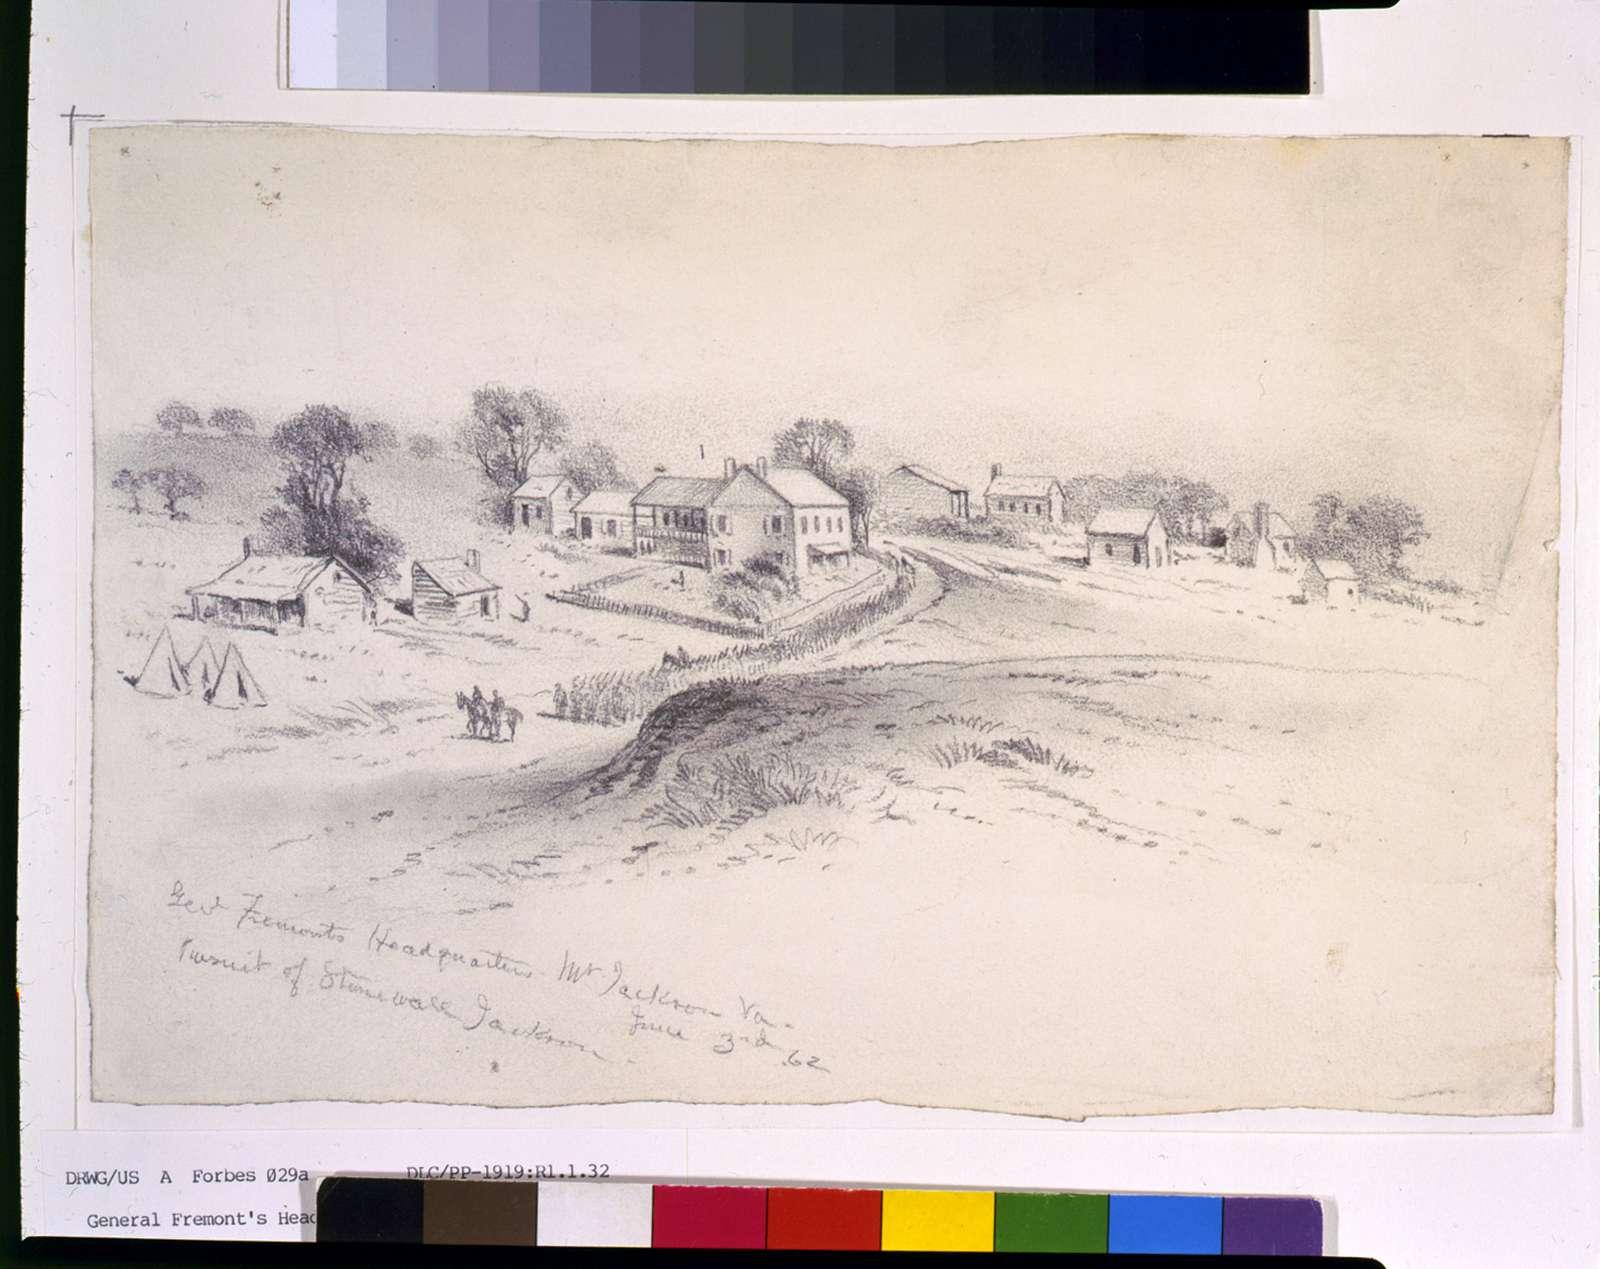 Genl. Fremonts Headquarters, Mt. Jackson, Va.--Pursuit of Stonewall Jackson